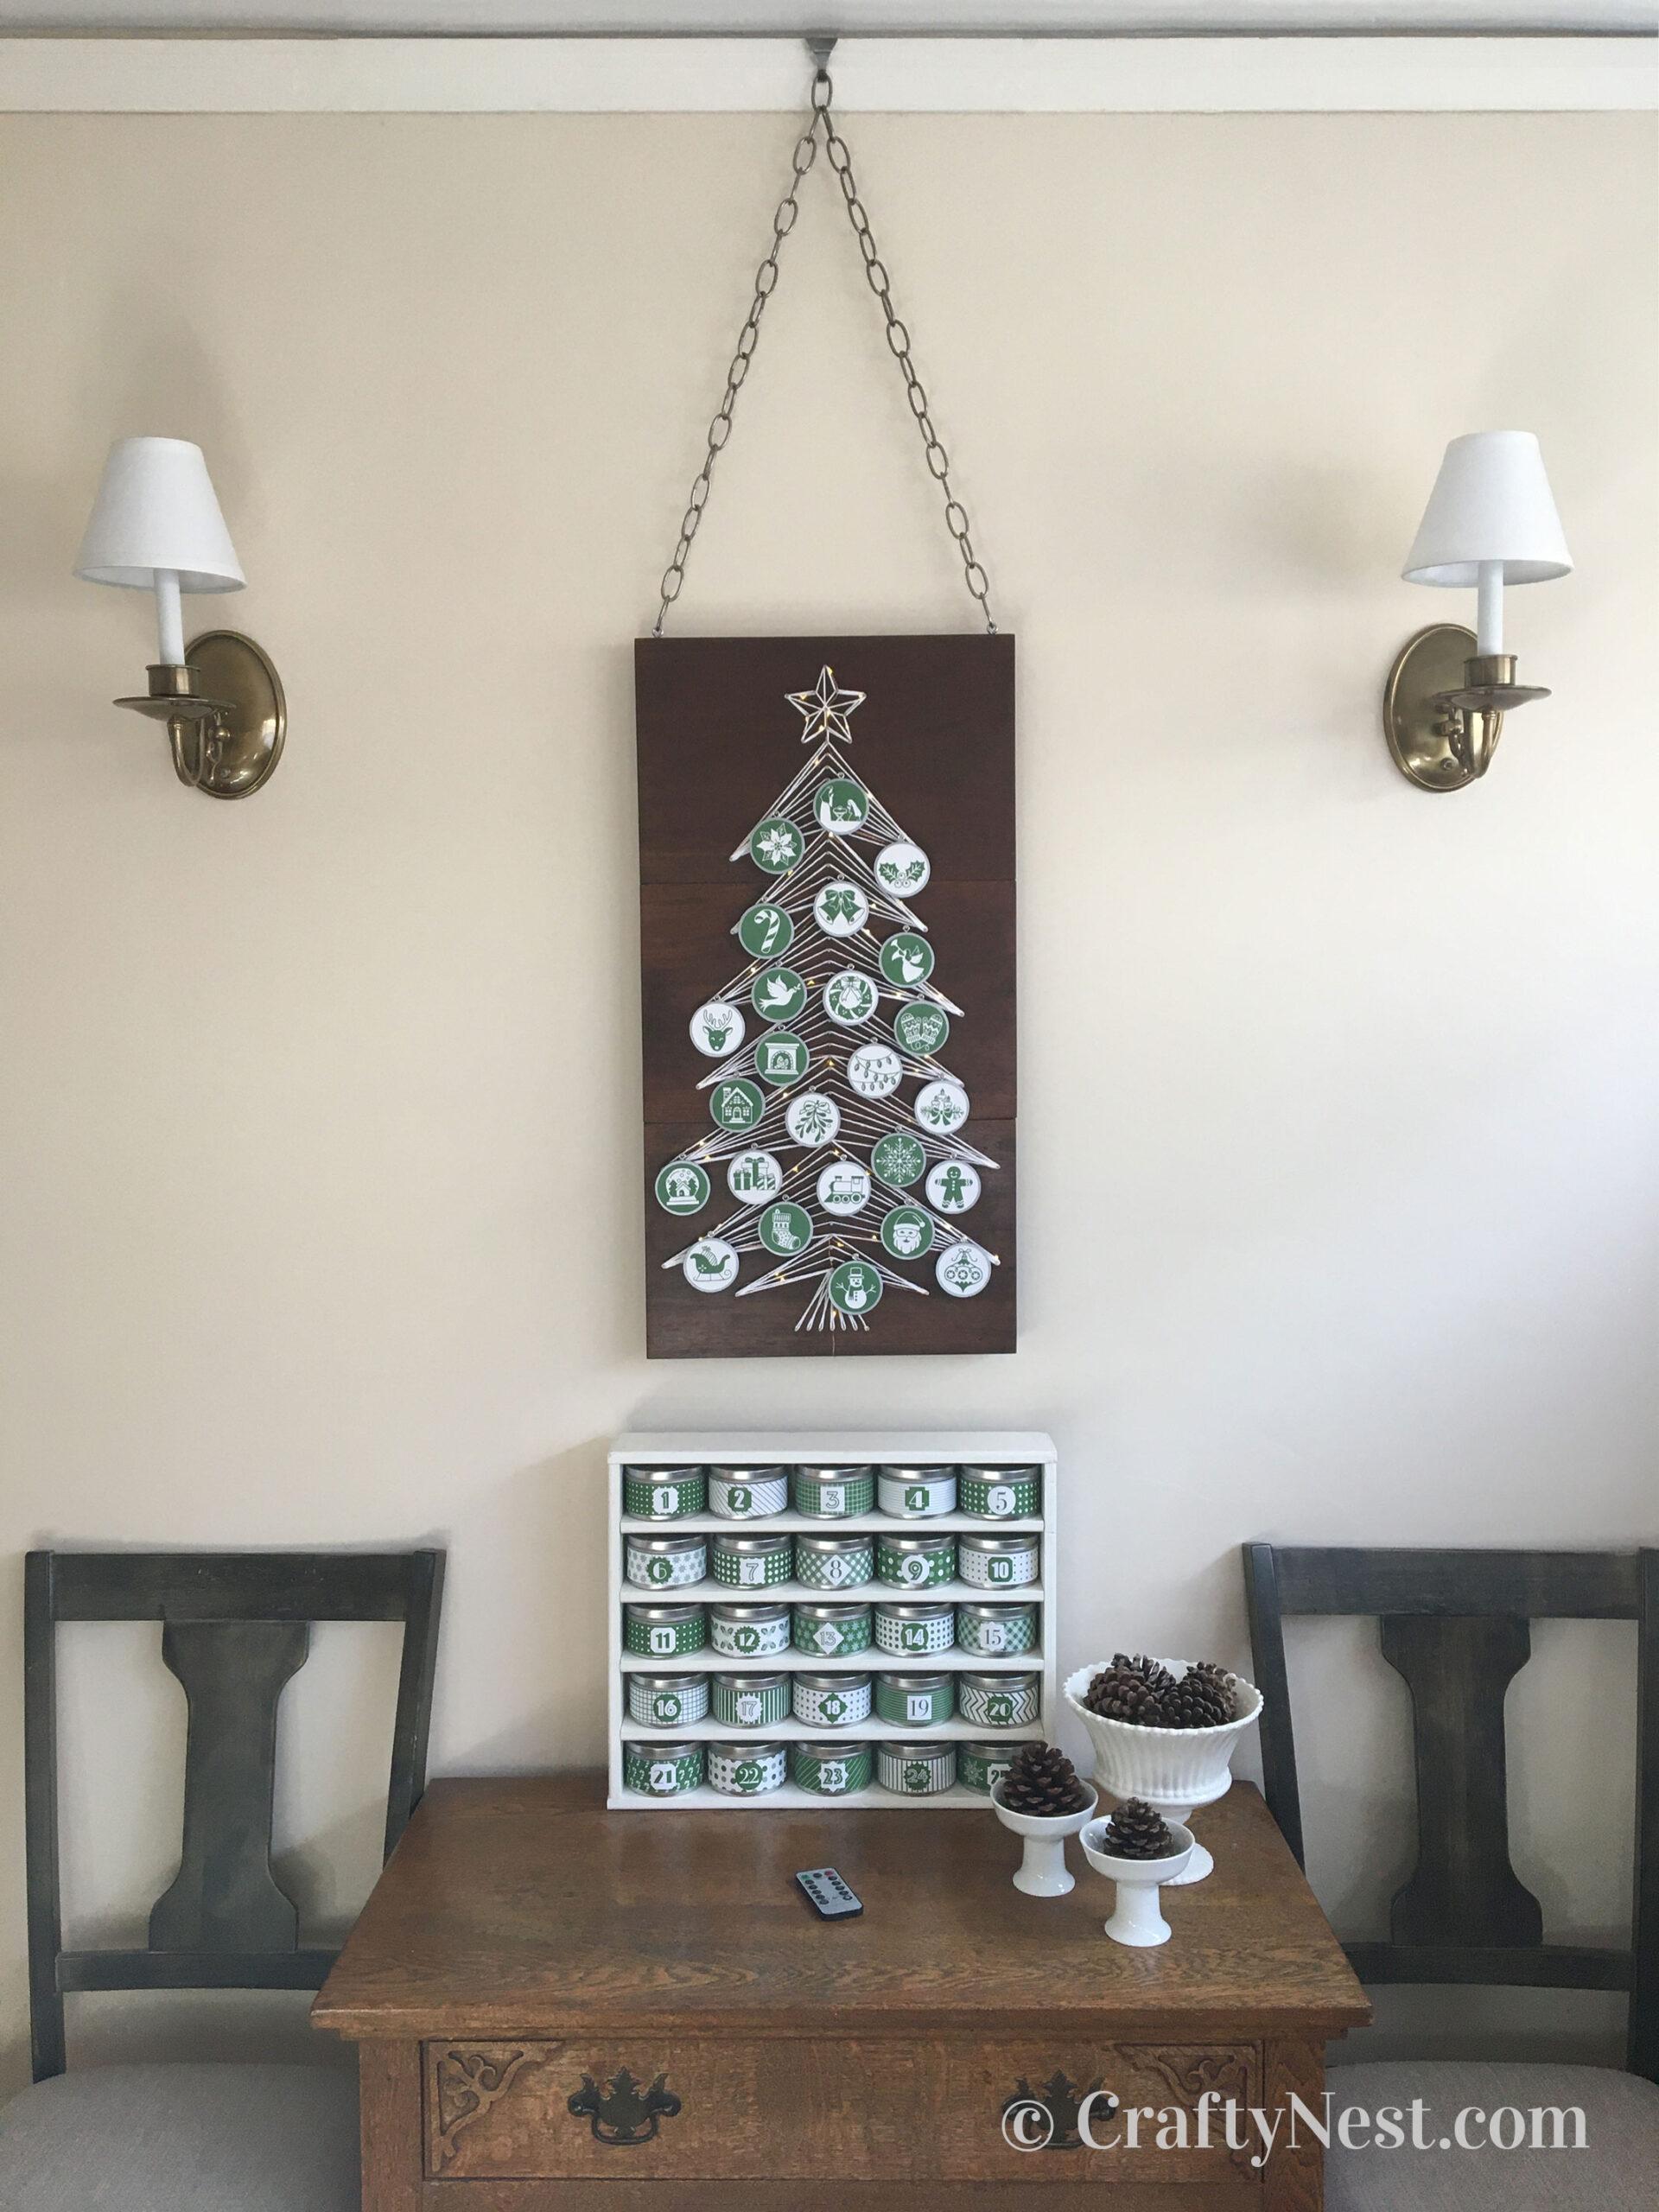 String art Christmas tree advent calendar, ornaments, and tins, photo